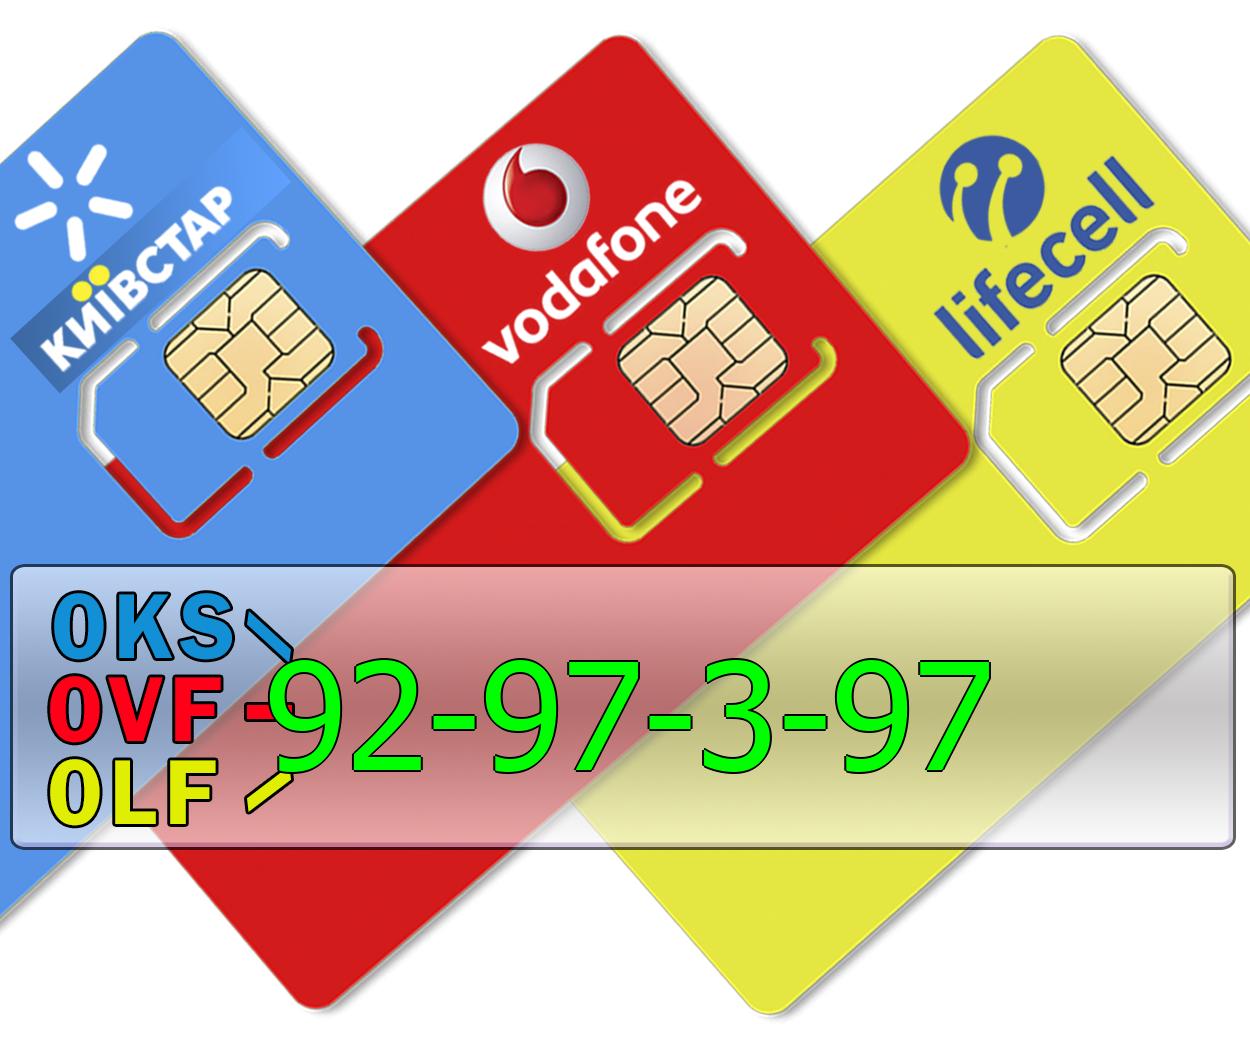 Трио 0KS-92-97-3-97 0LF-92-97-3-97 0VF-92-97-3-97 Киевстар, lifecell, Vodafone